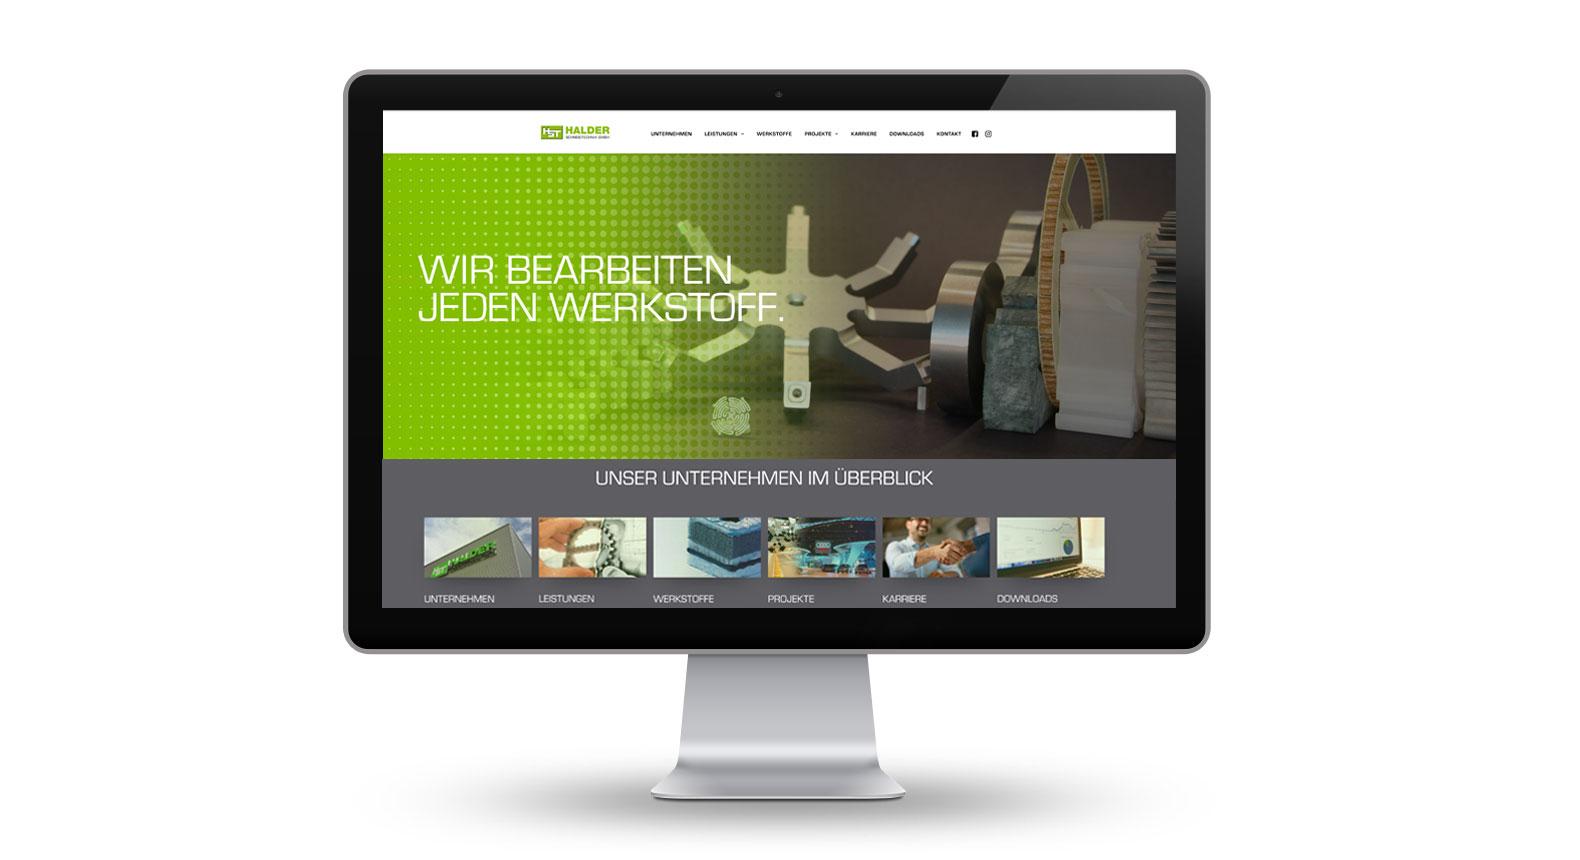 halder schneidtechnik website relaunch